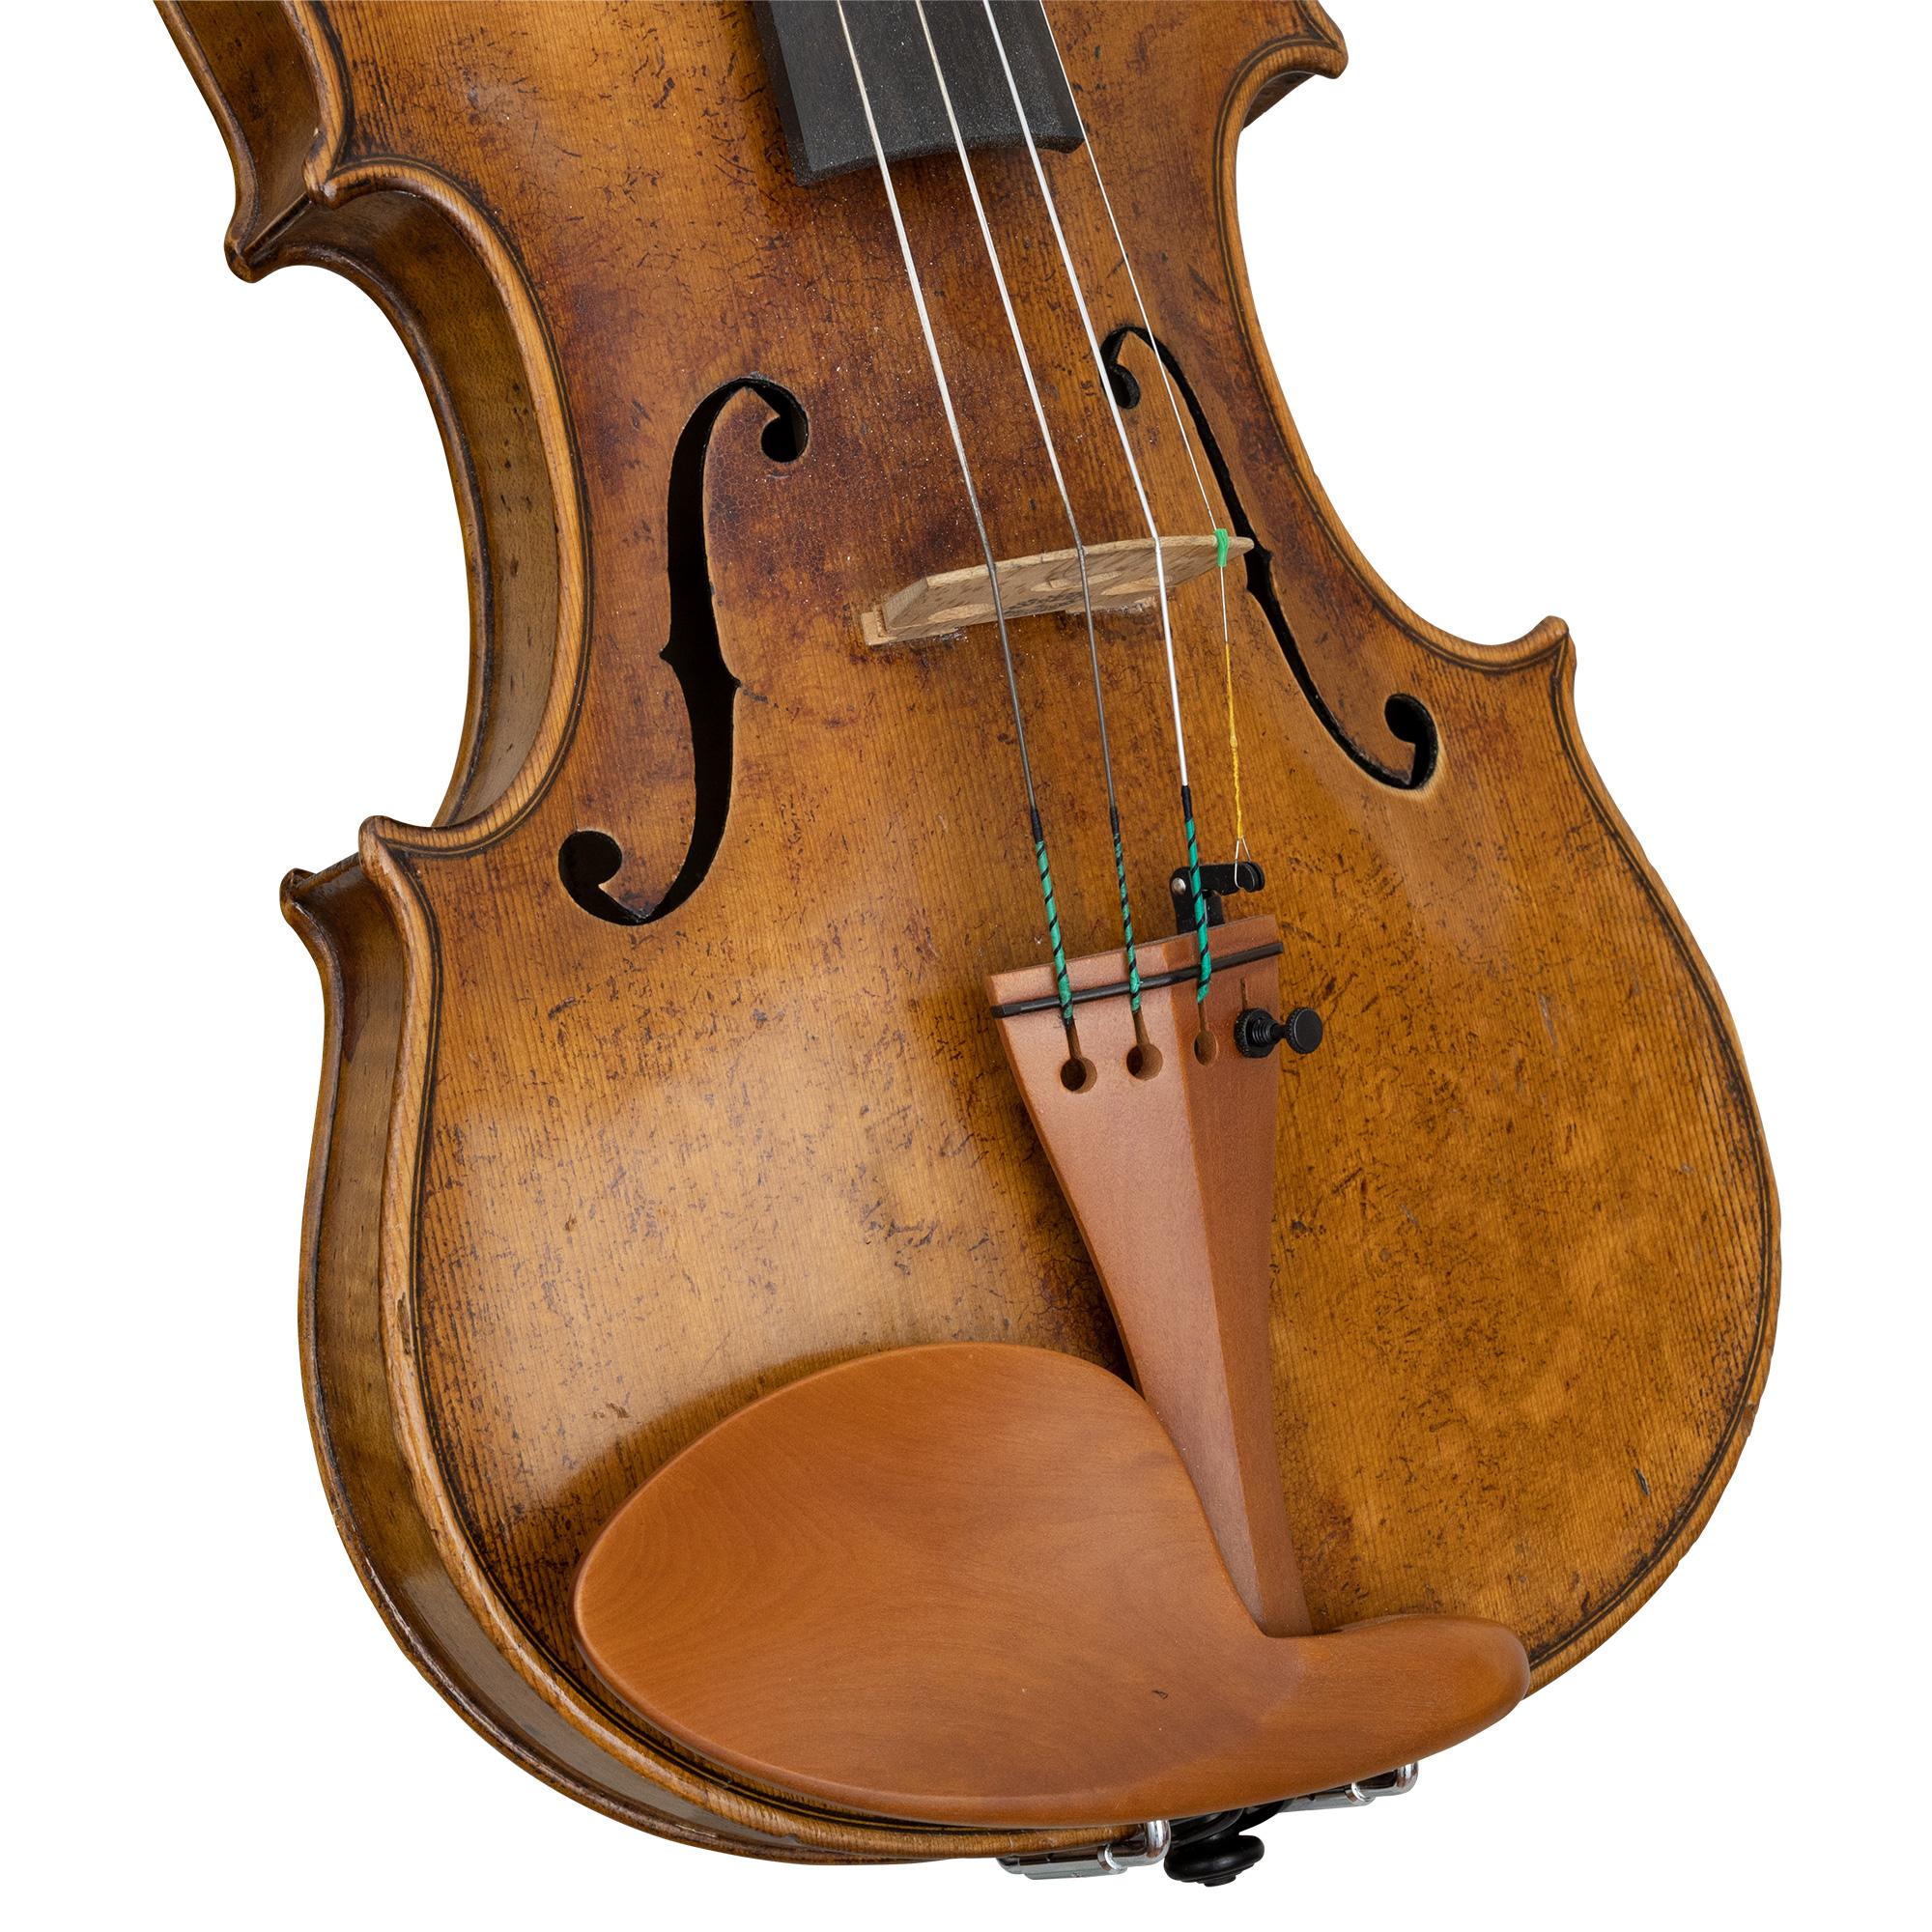 Carlo Bergonzi Copy 1757 Violin in action